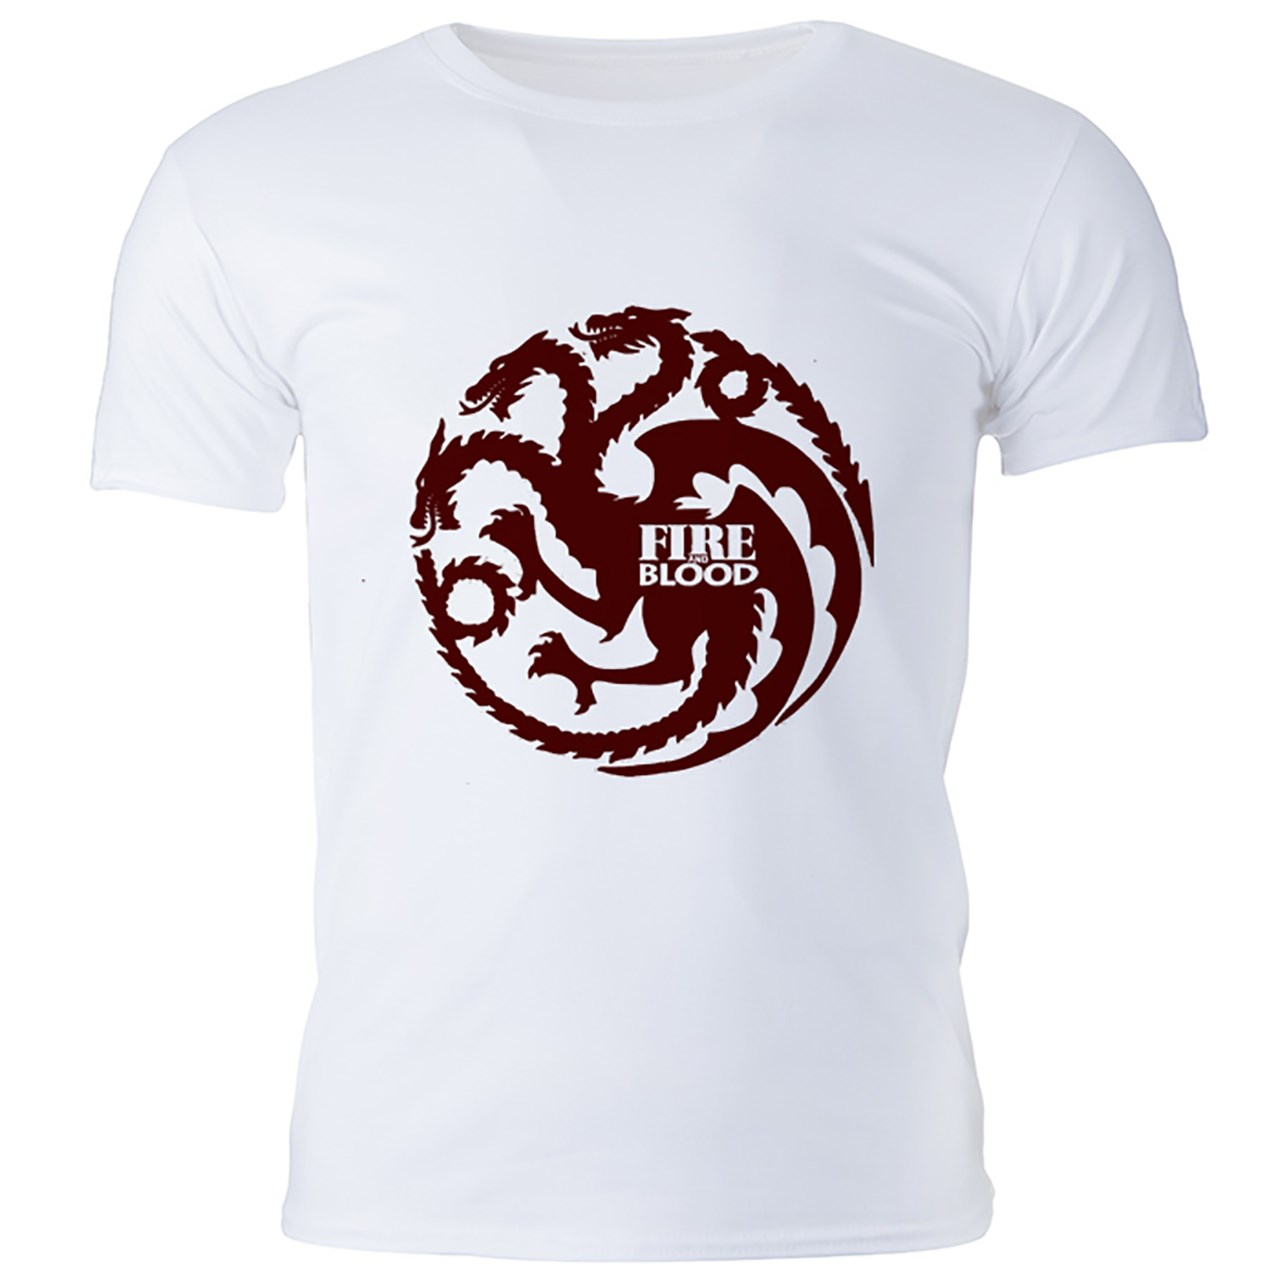 تی شرت مردانه گالری واو طرح Game of thrones Targaryen House کد CT10107